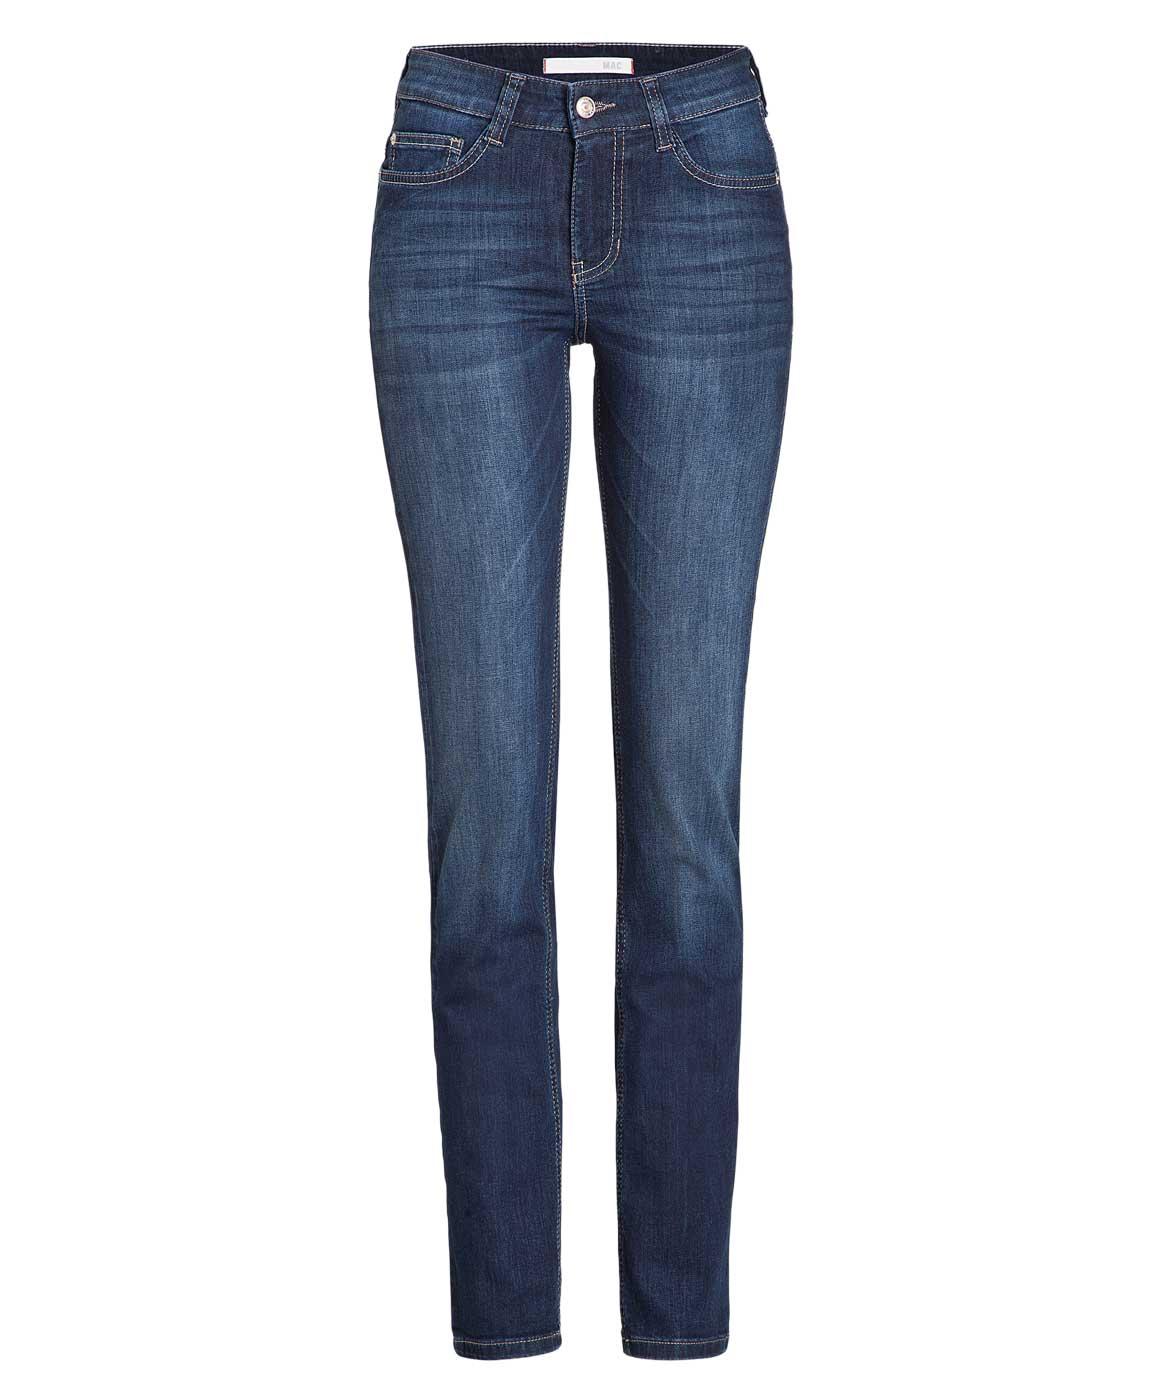 Angela Jeans - Slim Fit - New Basic Denim